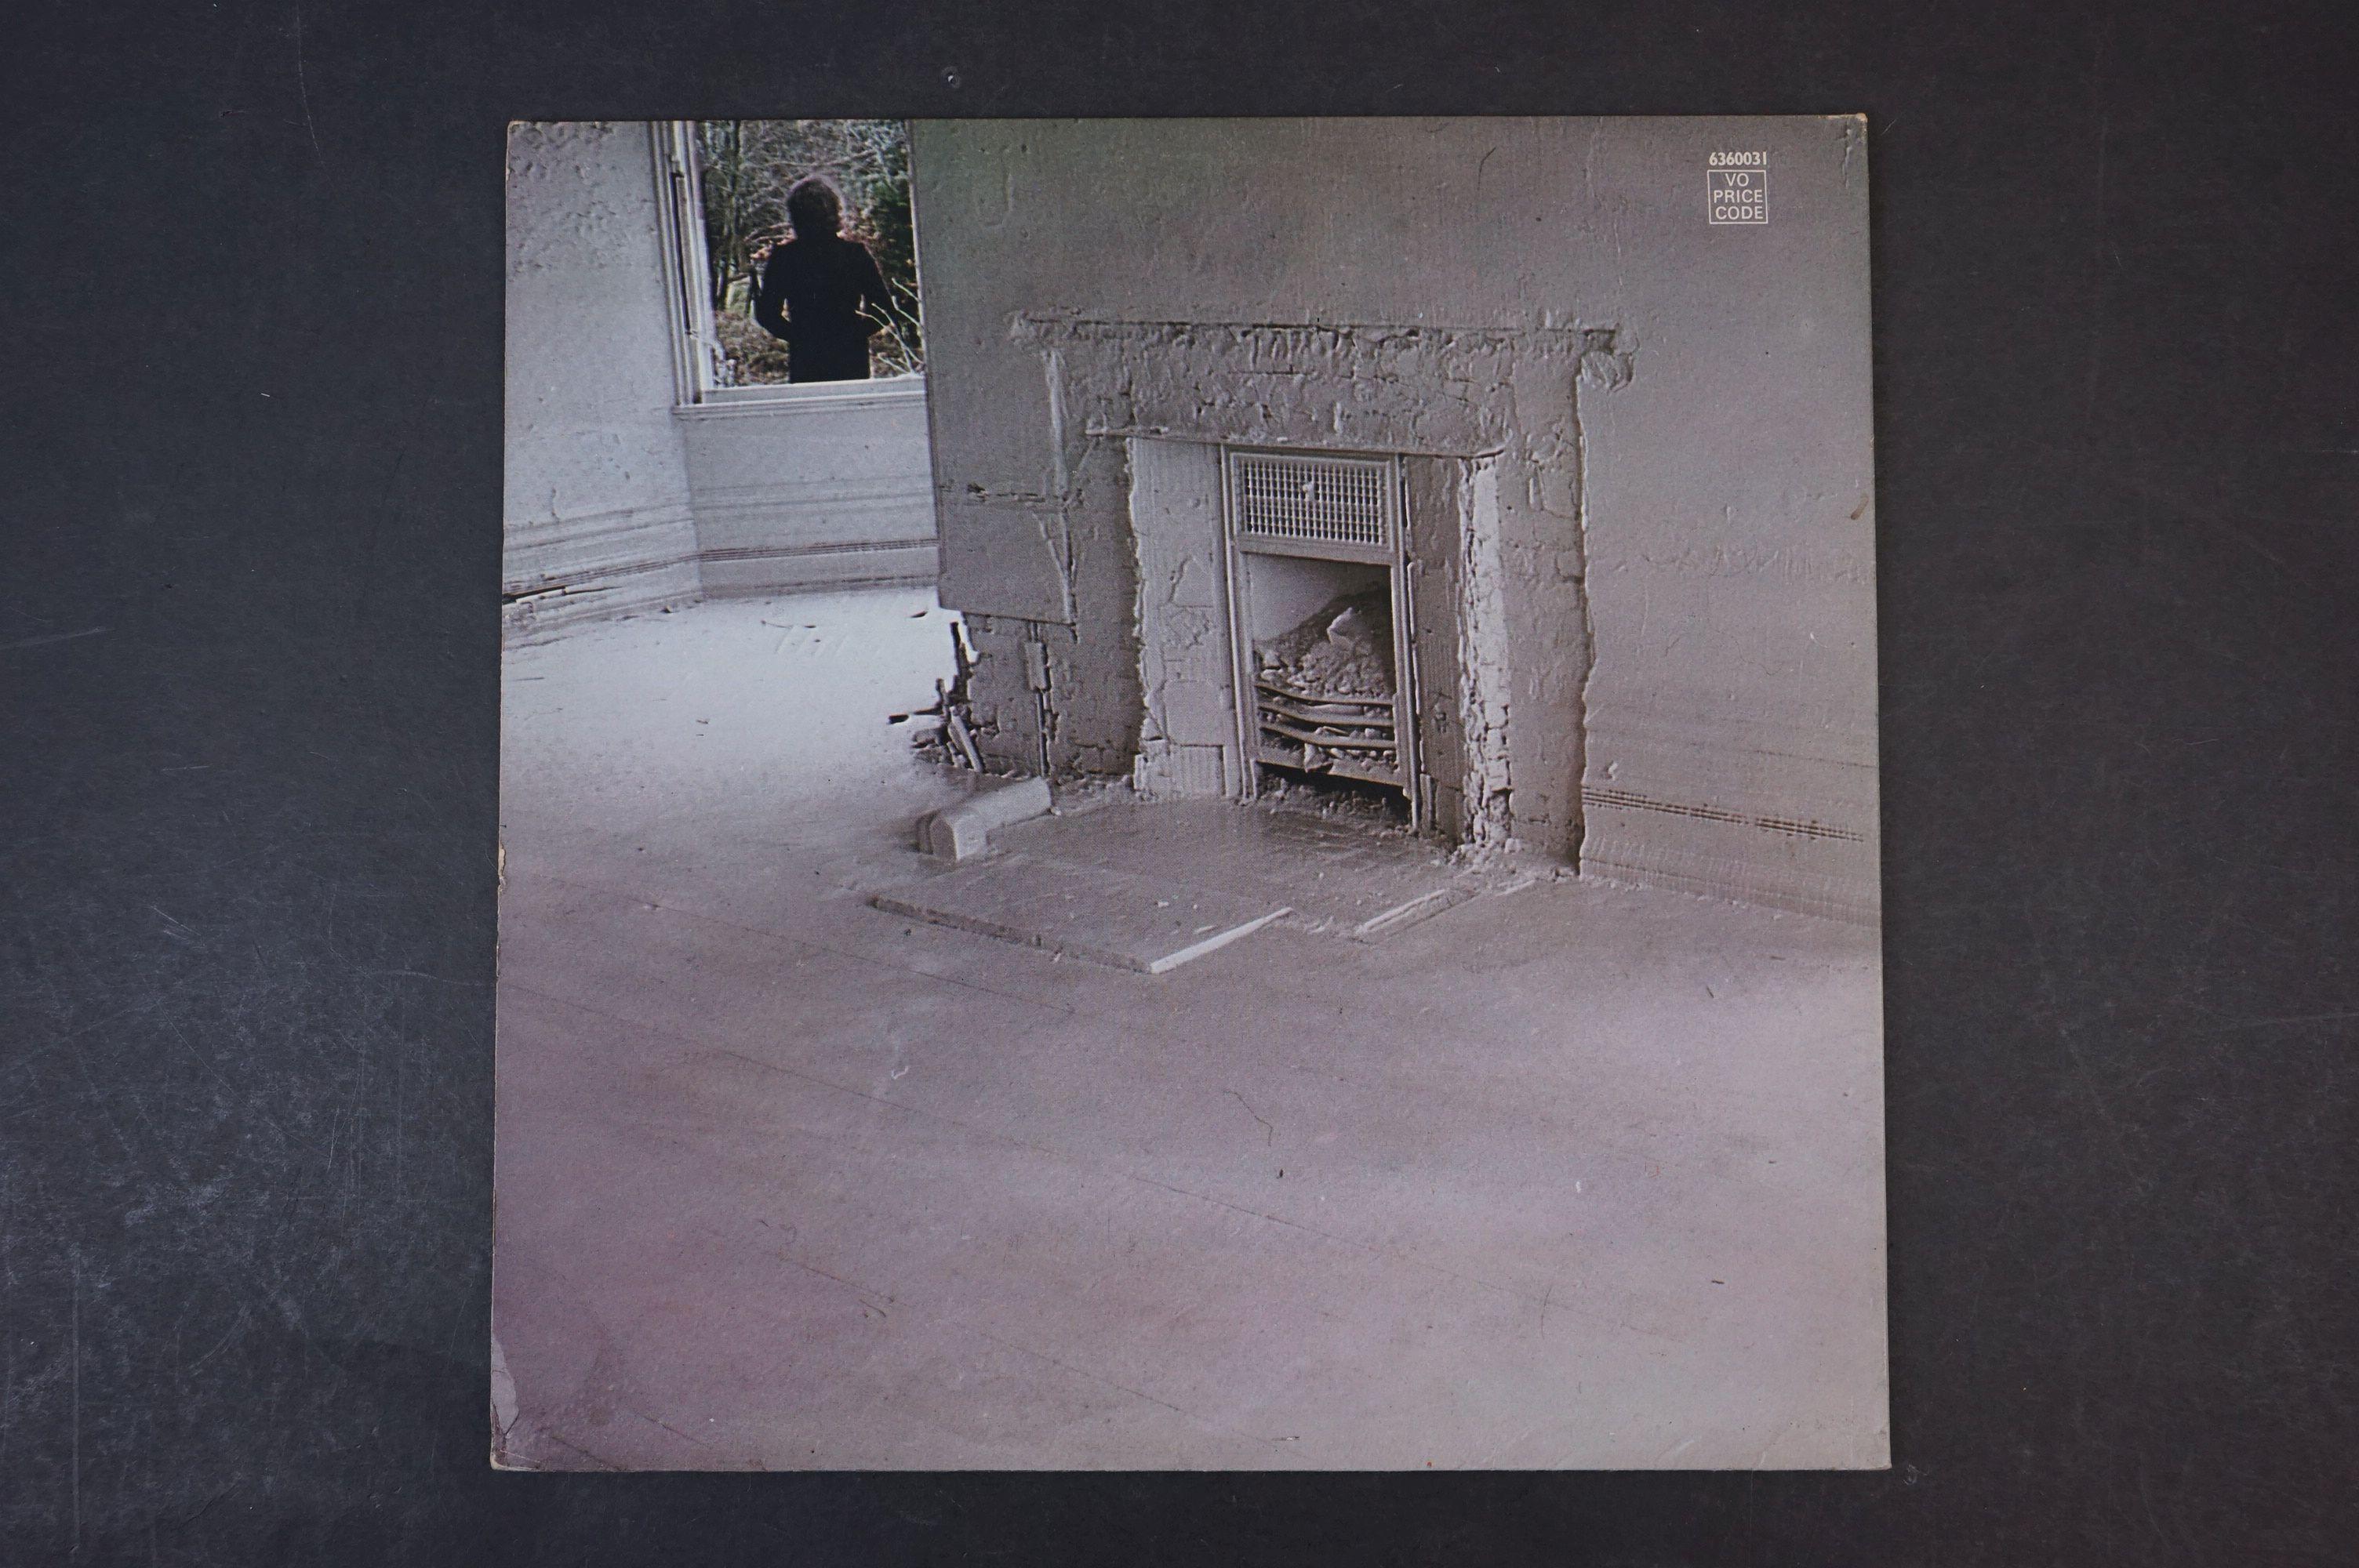 Vinyl - Nirvana Local Anaesthetic LP on Vertigo VO 6360031 gatefold sleeve, swirl logo, swirl - Image 4 of 8